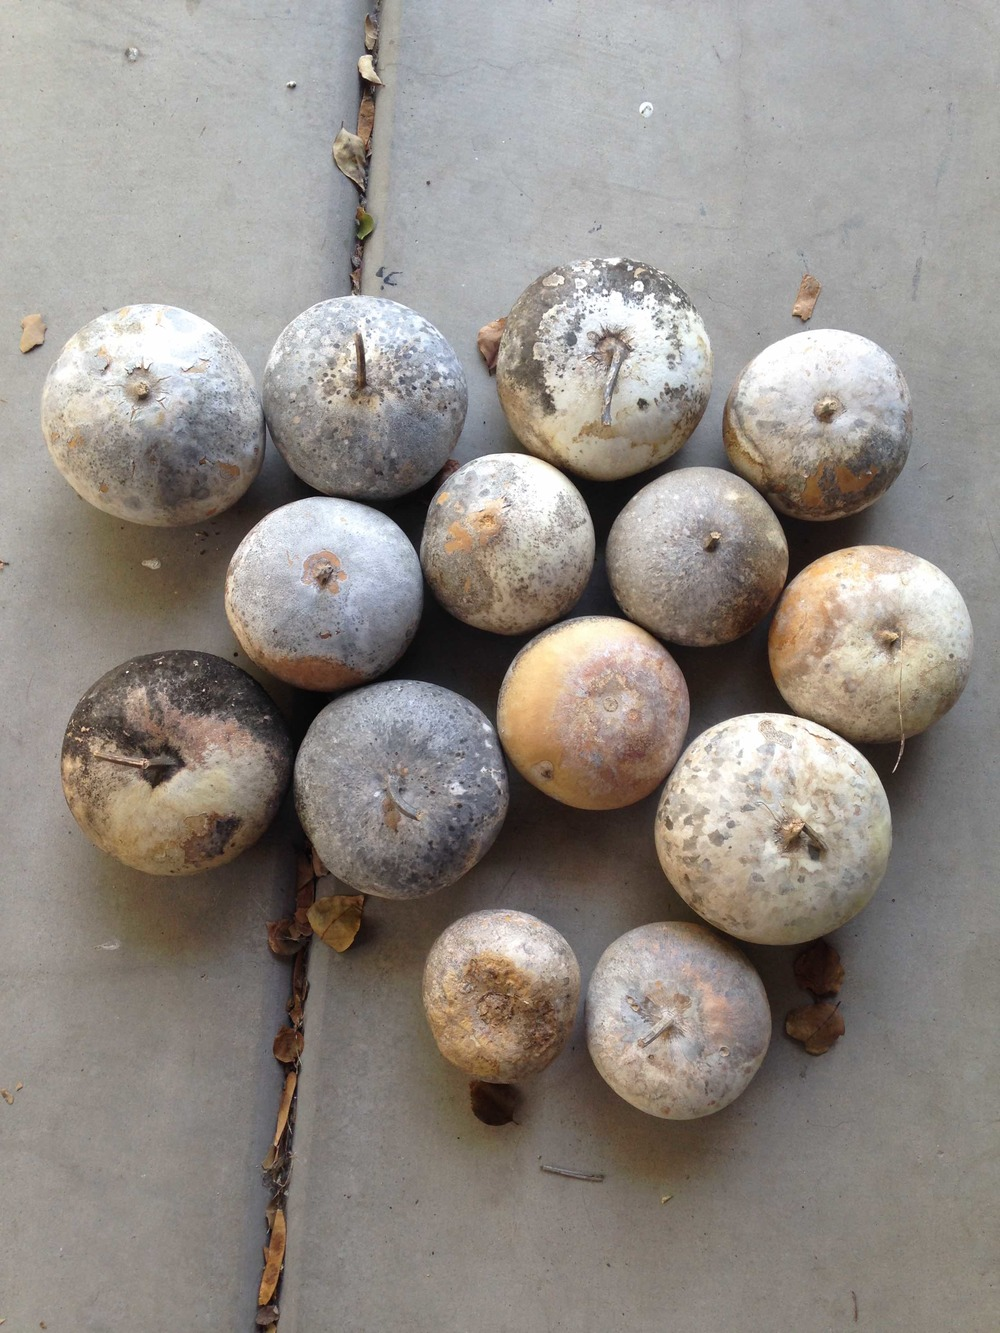 Step 1: Gather gourds